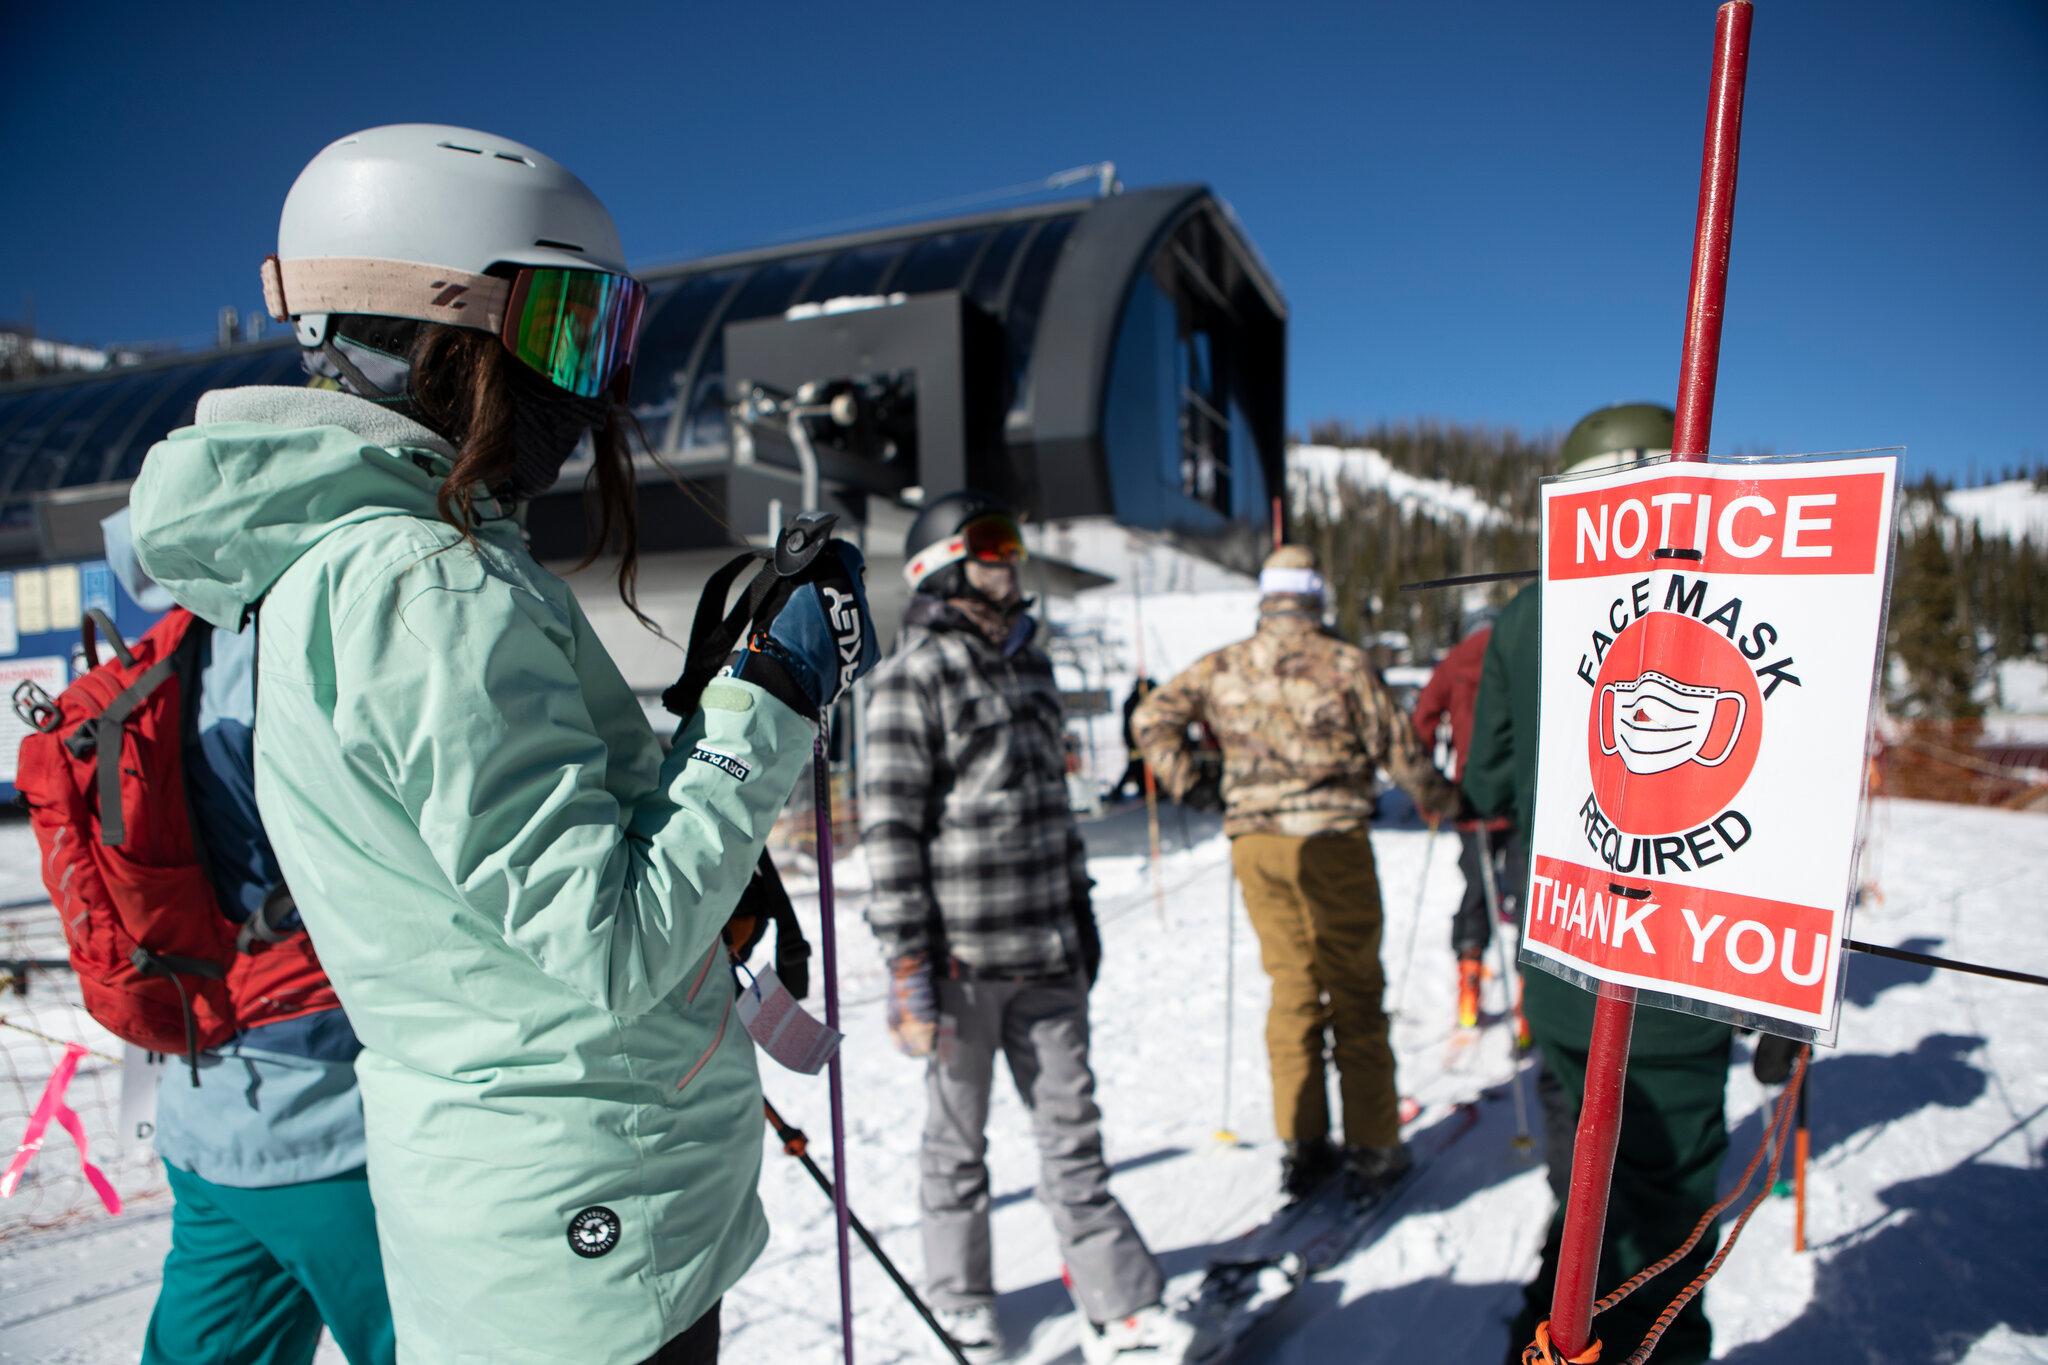 Prepare For the Ski Season in a Pandemic